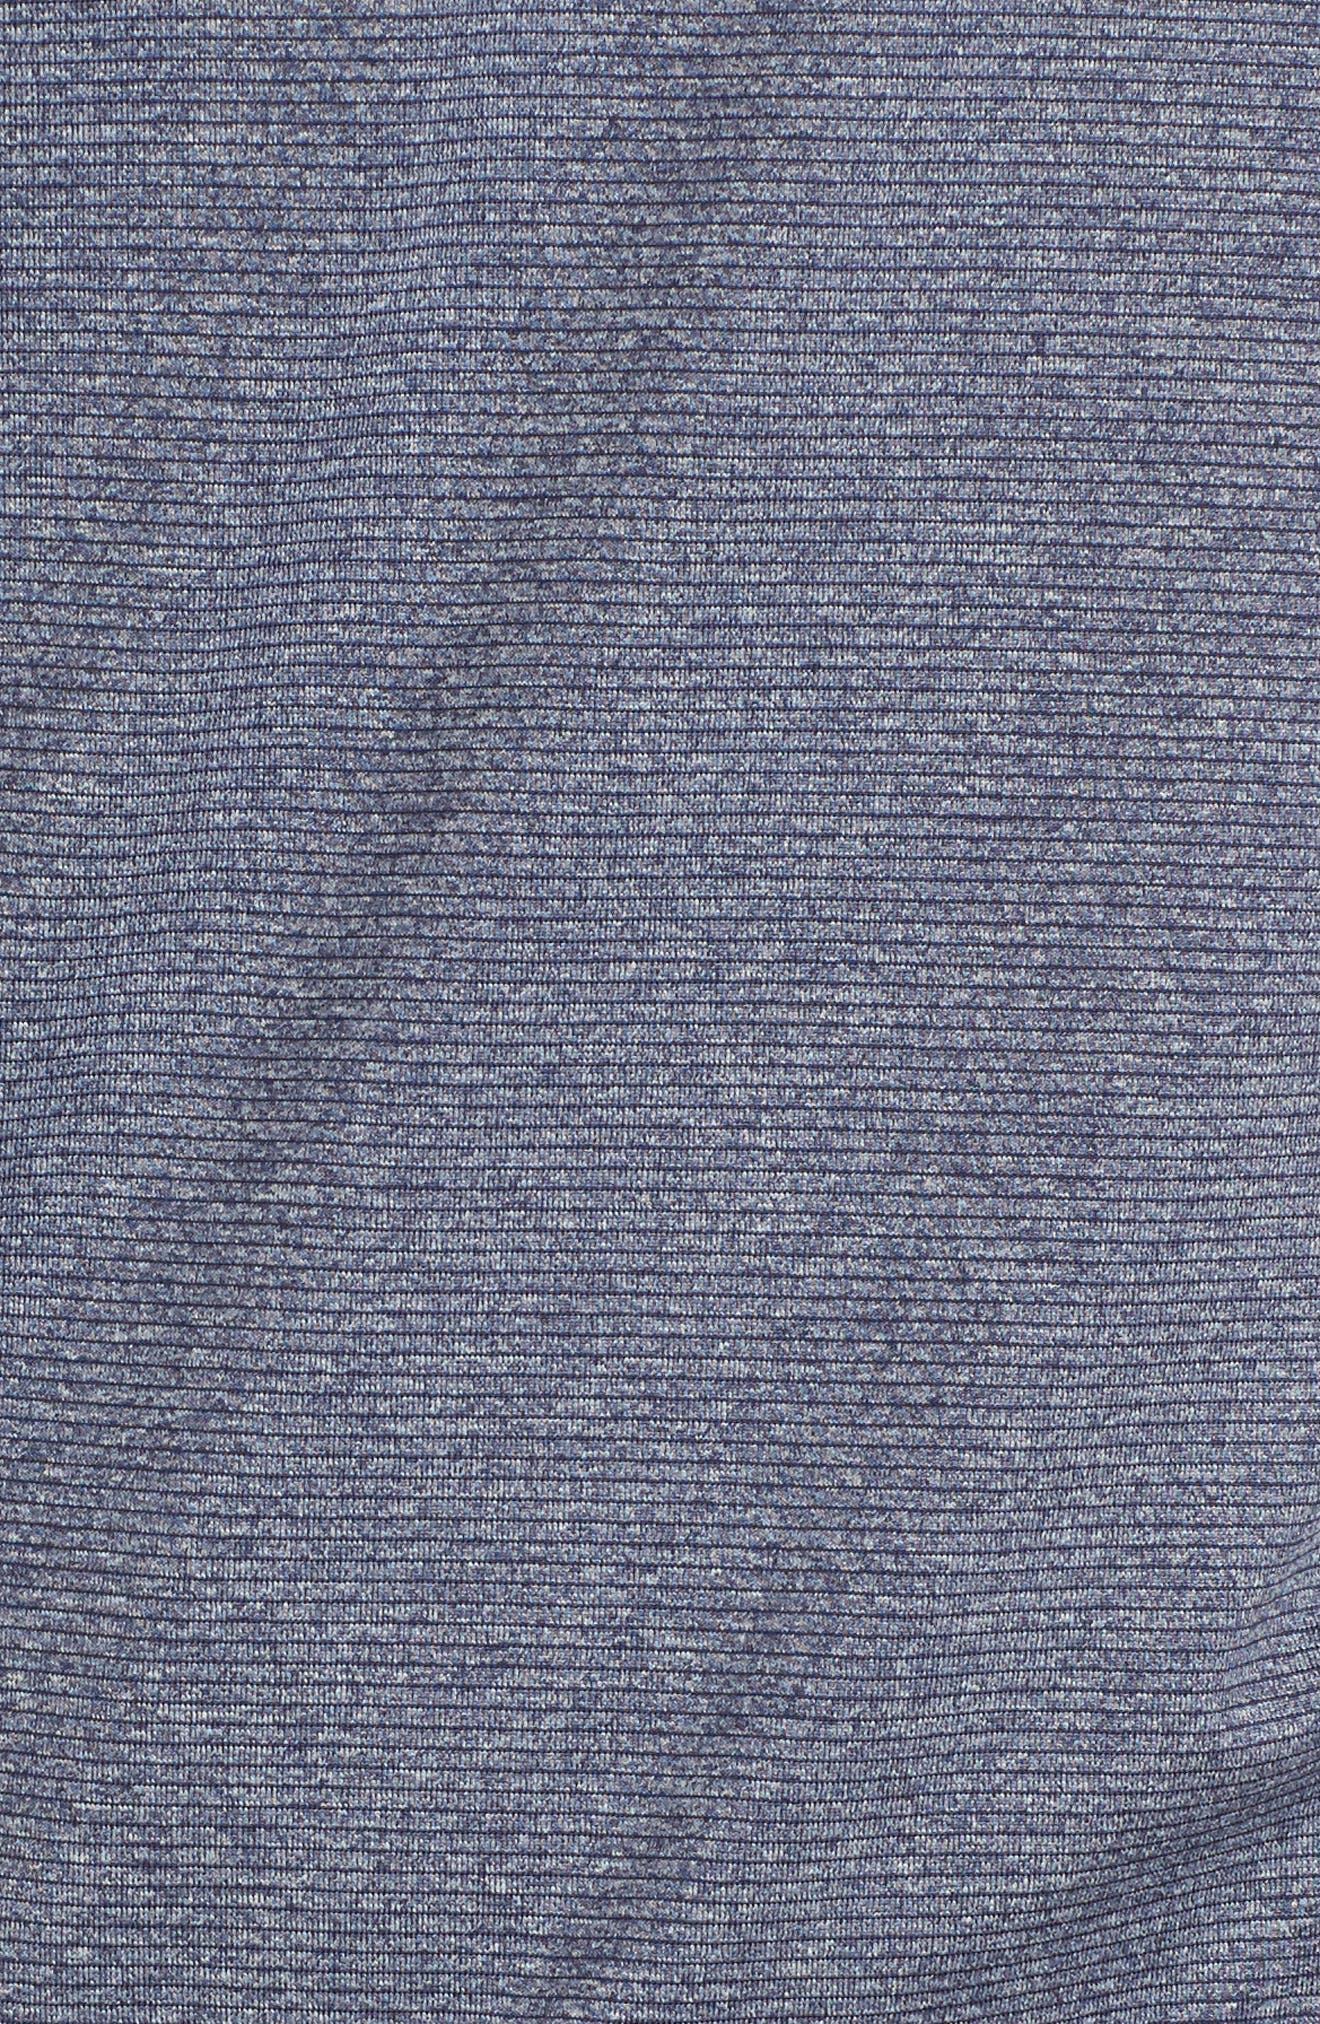 Shoreline - New England Patriots Half Zip Pullover,                             Alternate thumbnail 5, color,                             Liberty Navy Heather